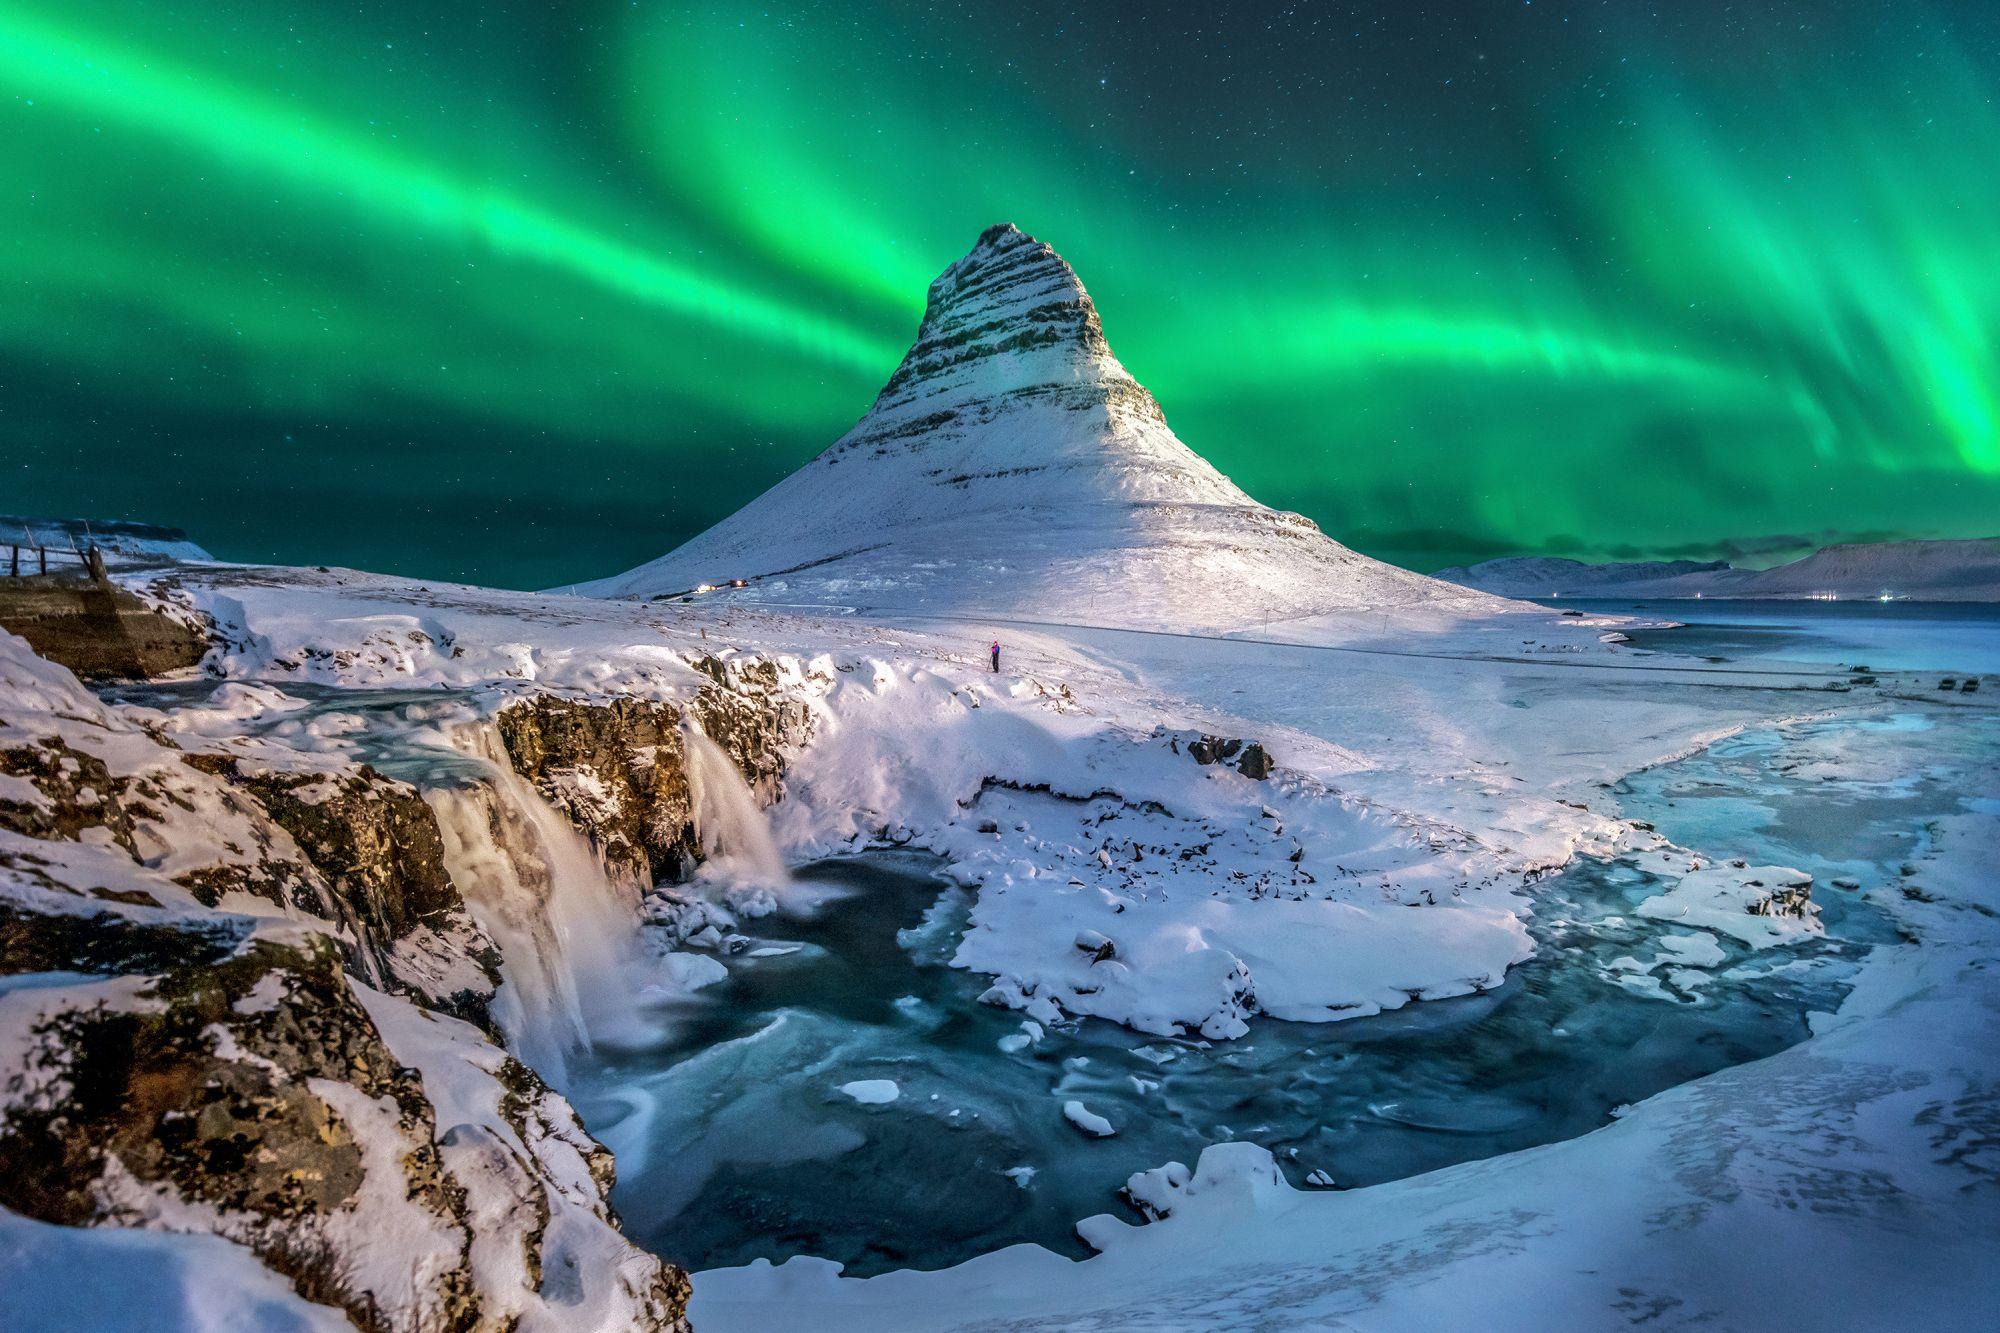 islandia zima zorza